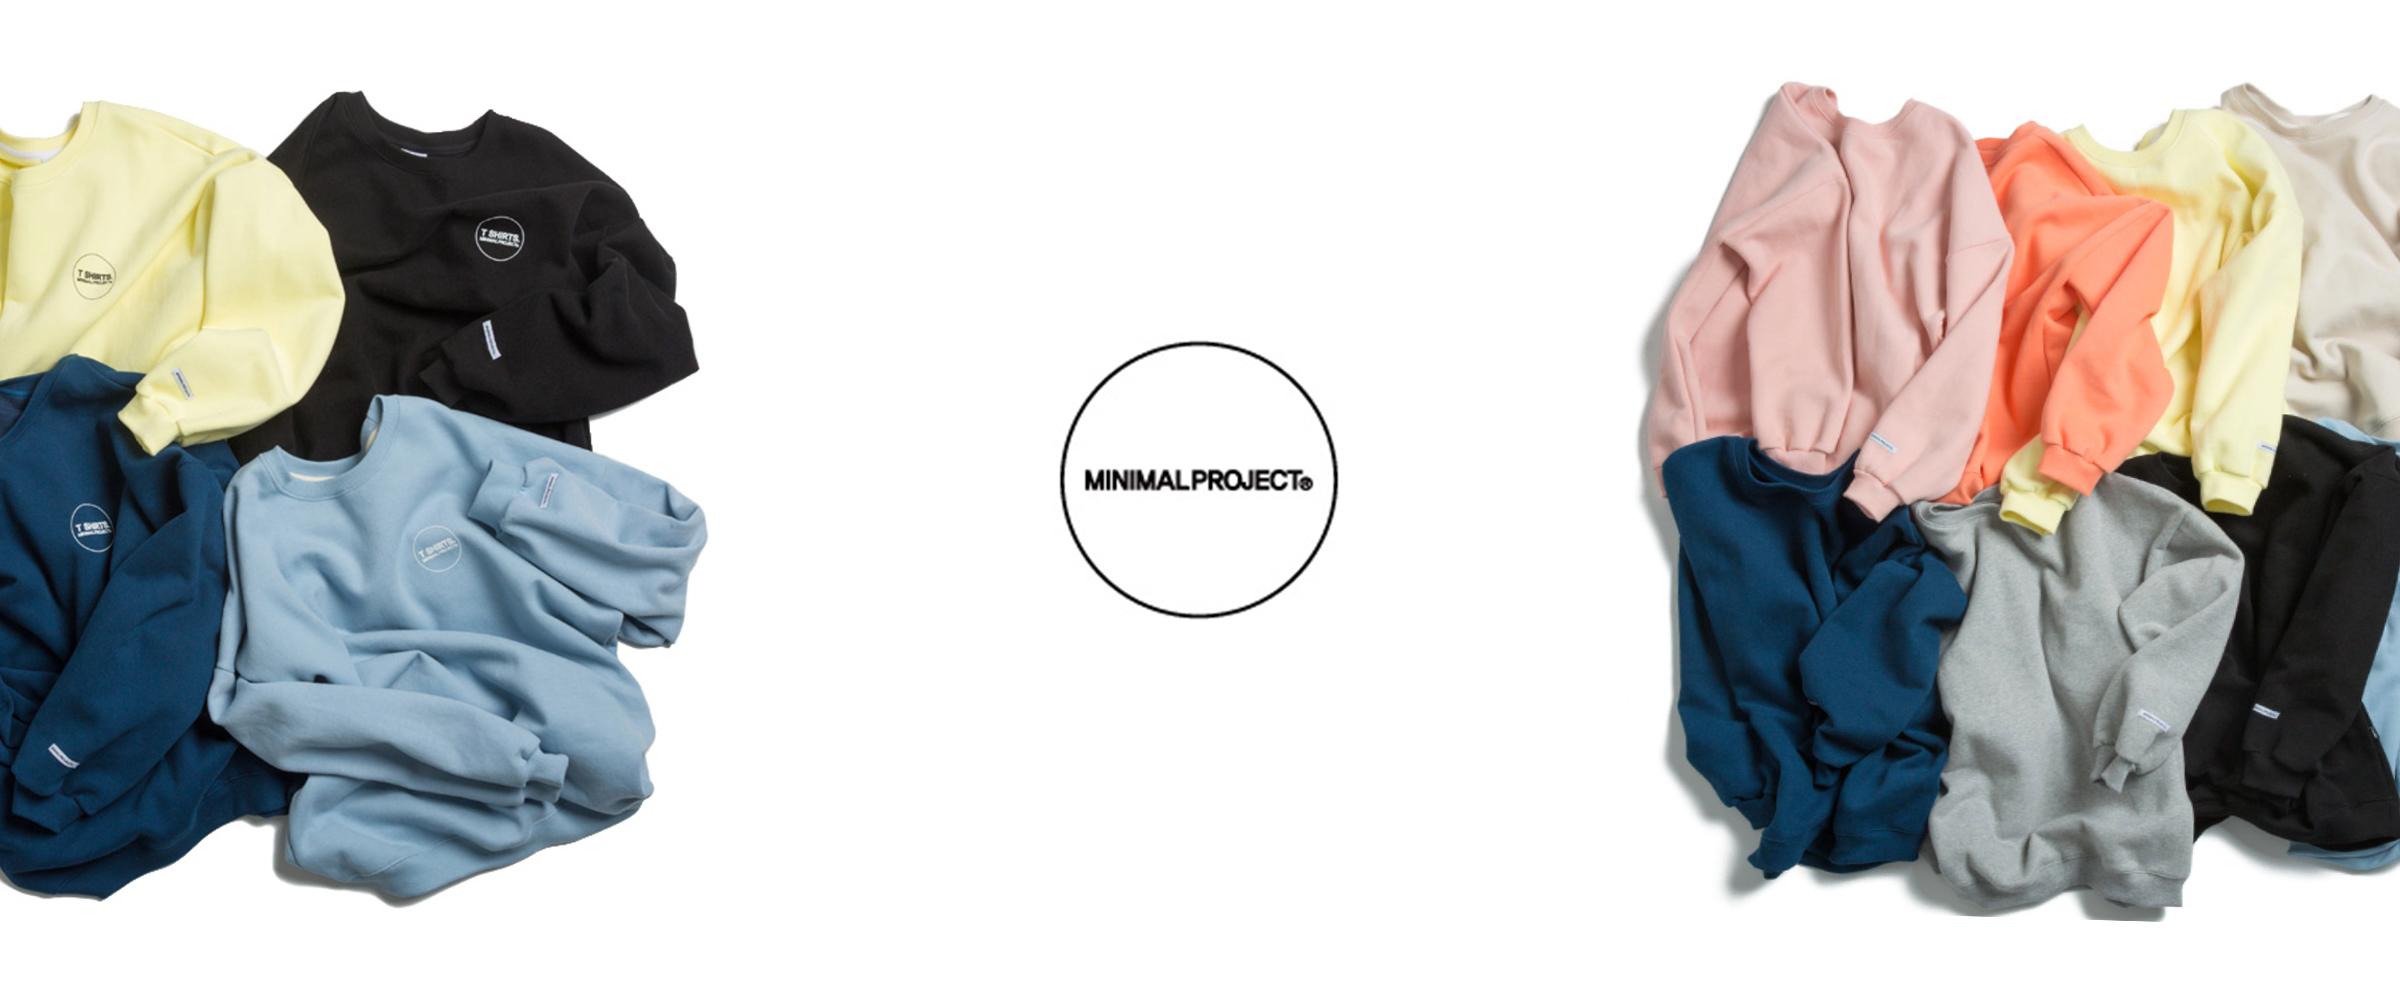 minimalproject.jpg